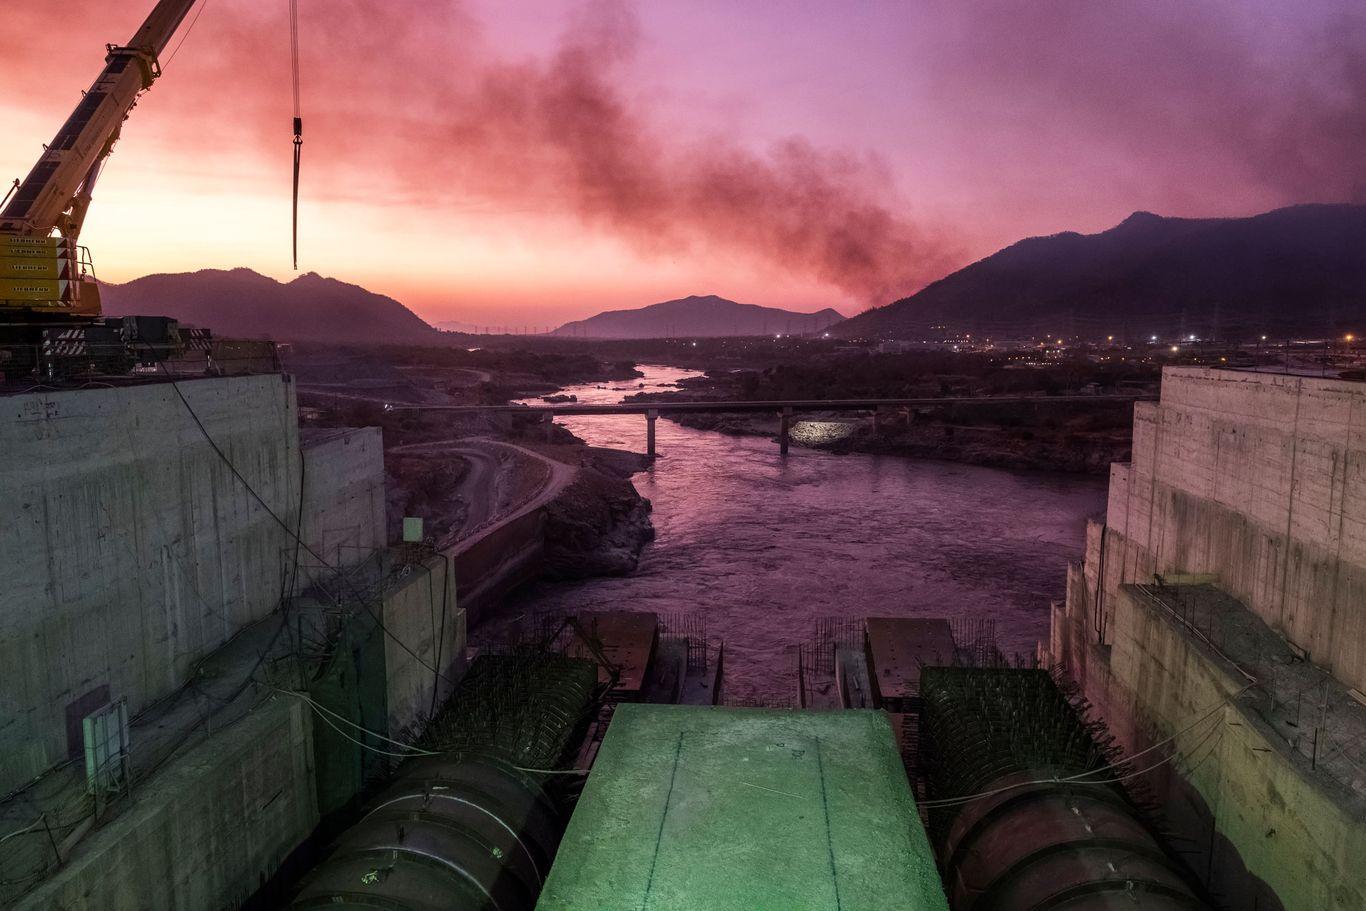 Dam dispute heats up between Egypt and Ethiopia